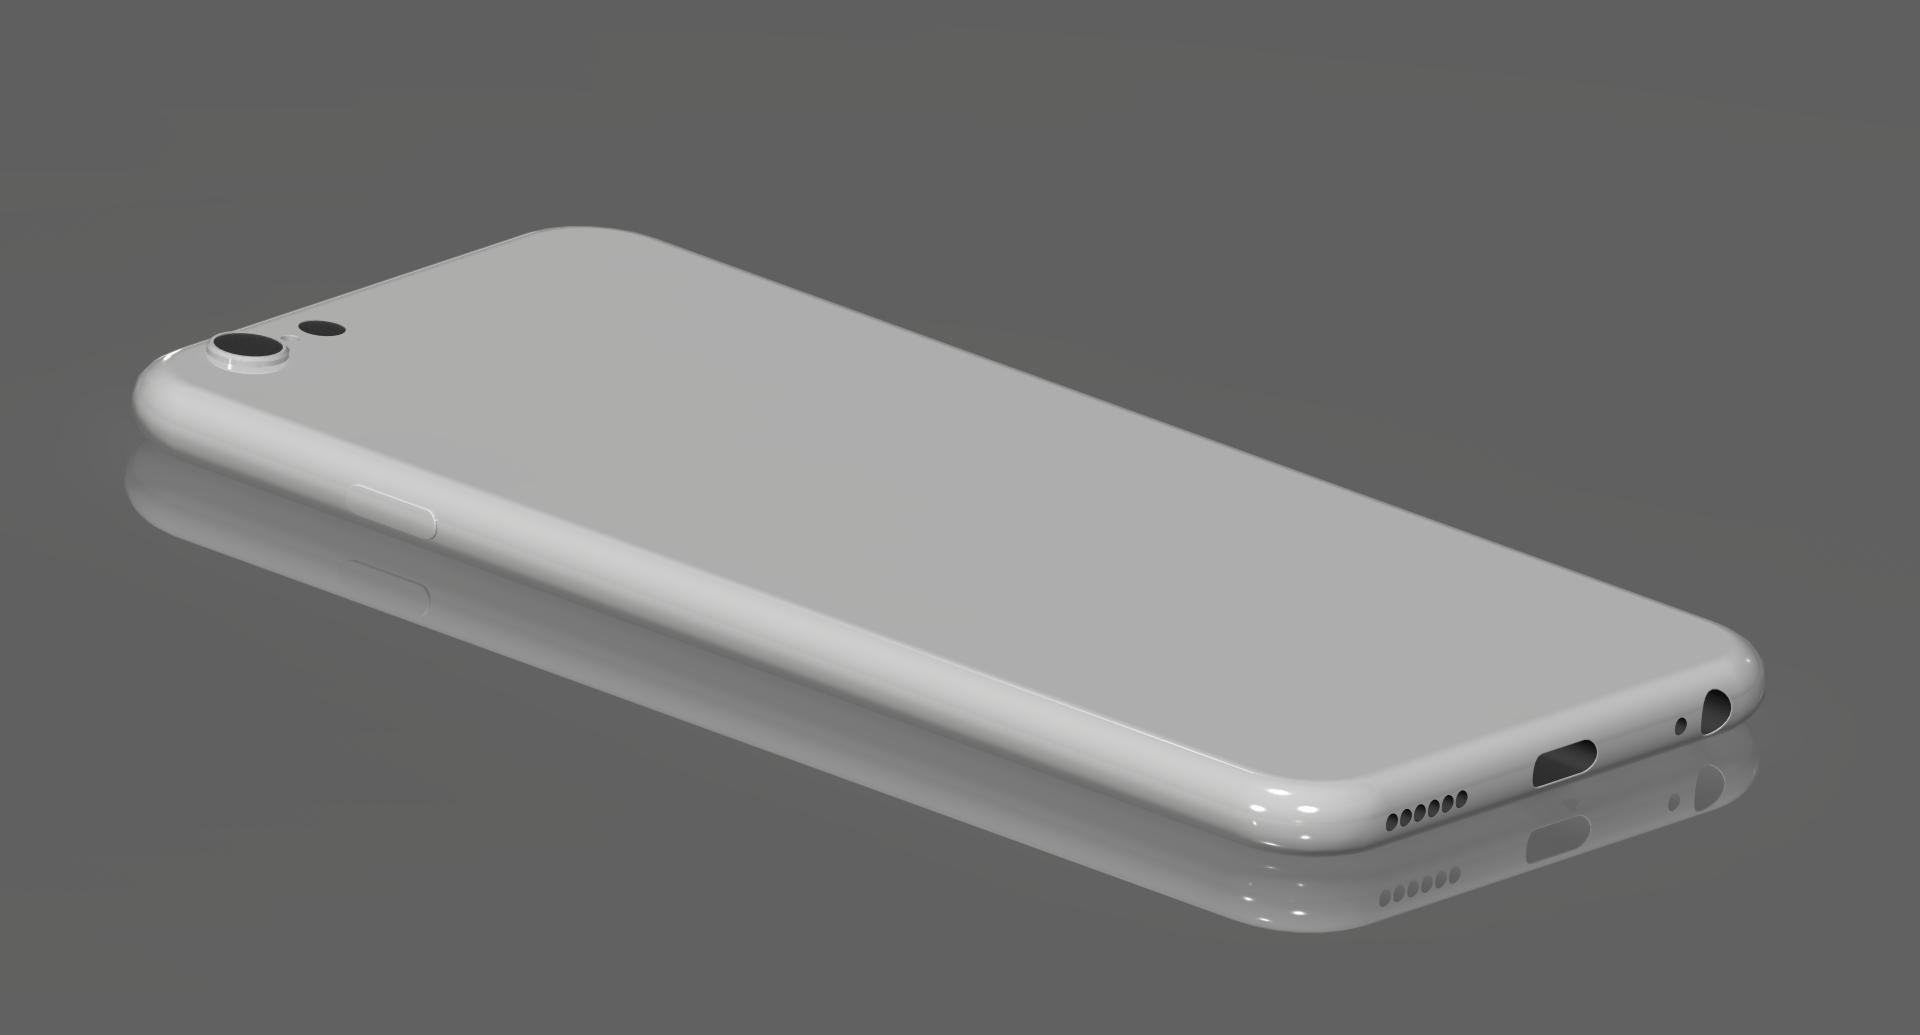 Printable Iphone 6 Mockup Iphone 6 Mockup